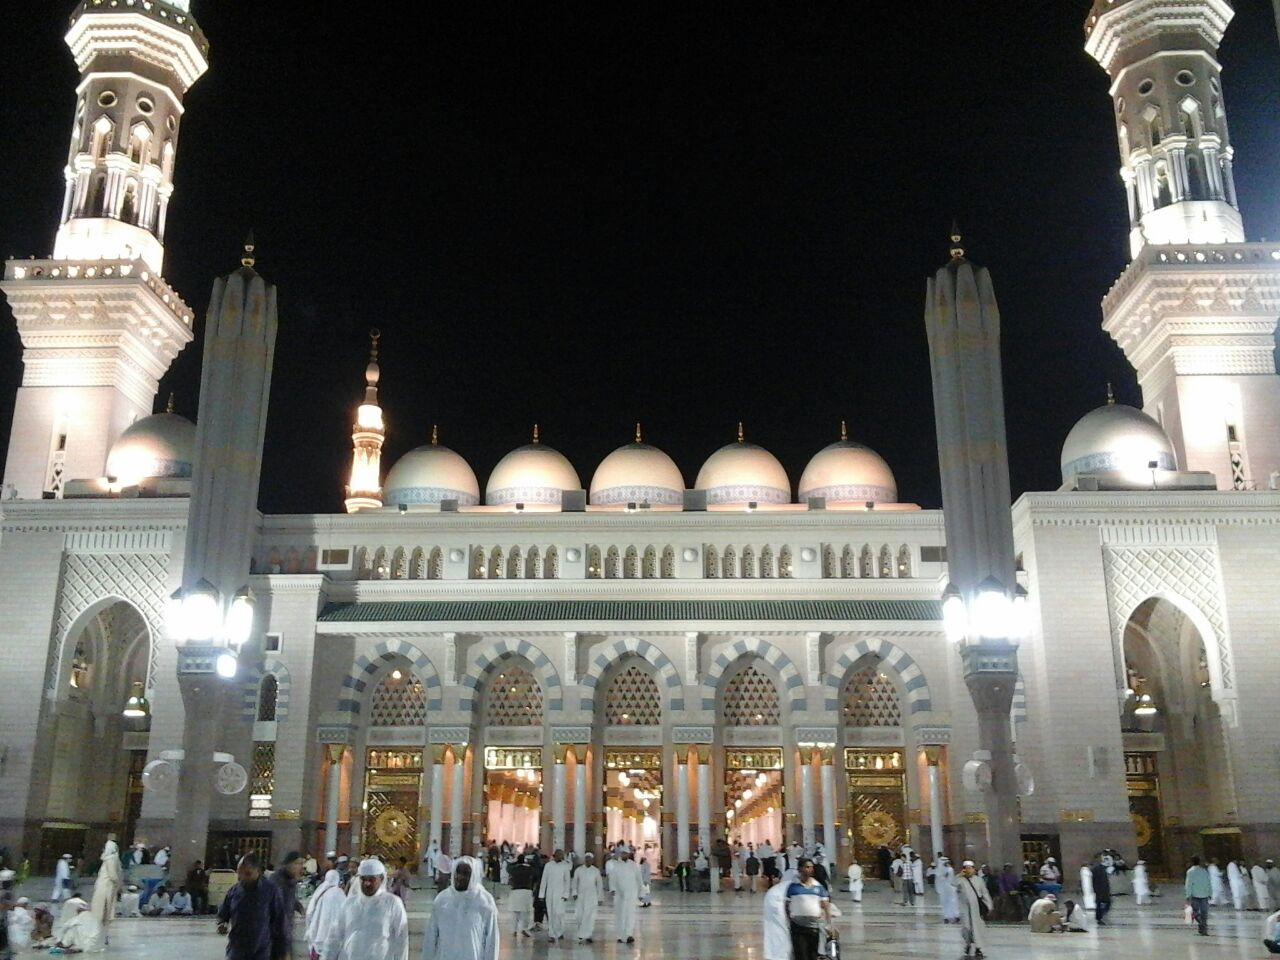 Saudi Arabia - Madinah 2014